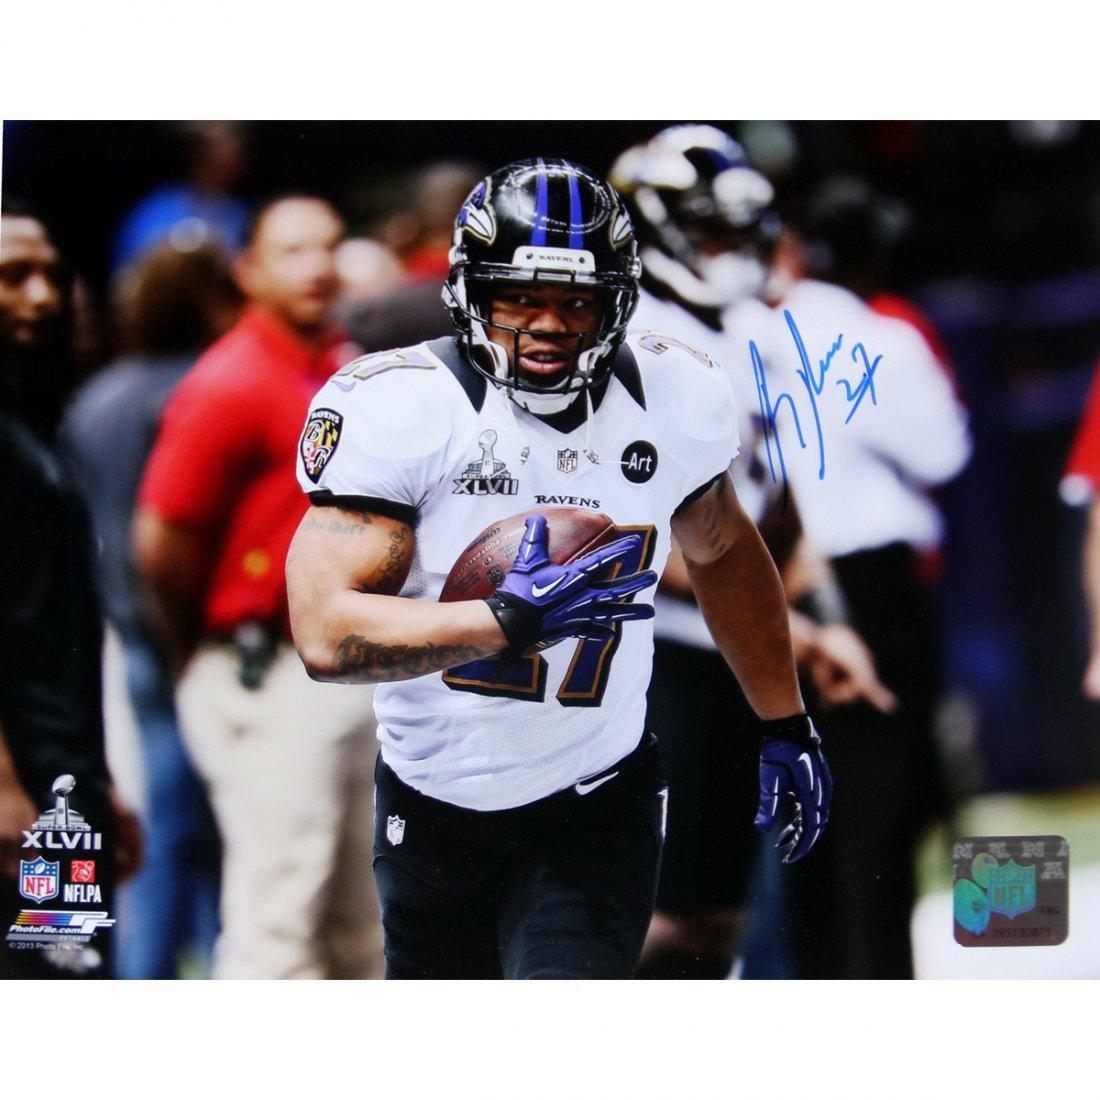 Ray Rice Super Bowl XLVII Signed 8x10 Photo (PF)